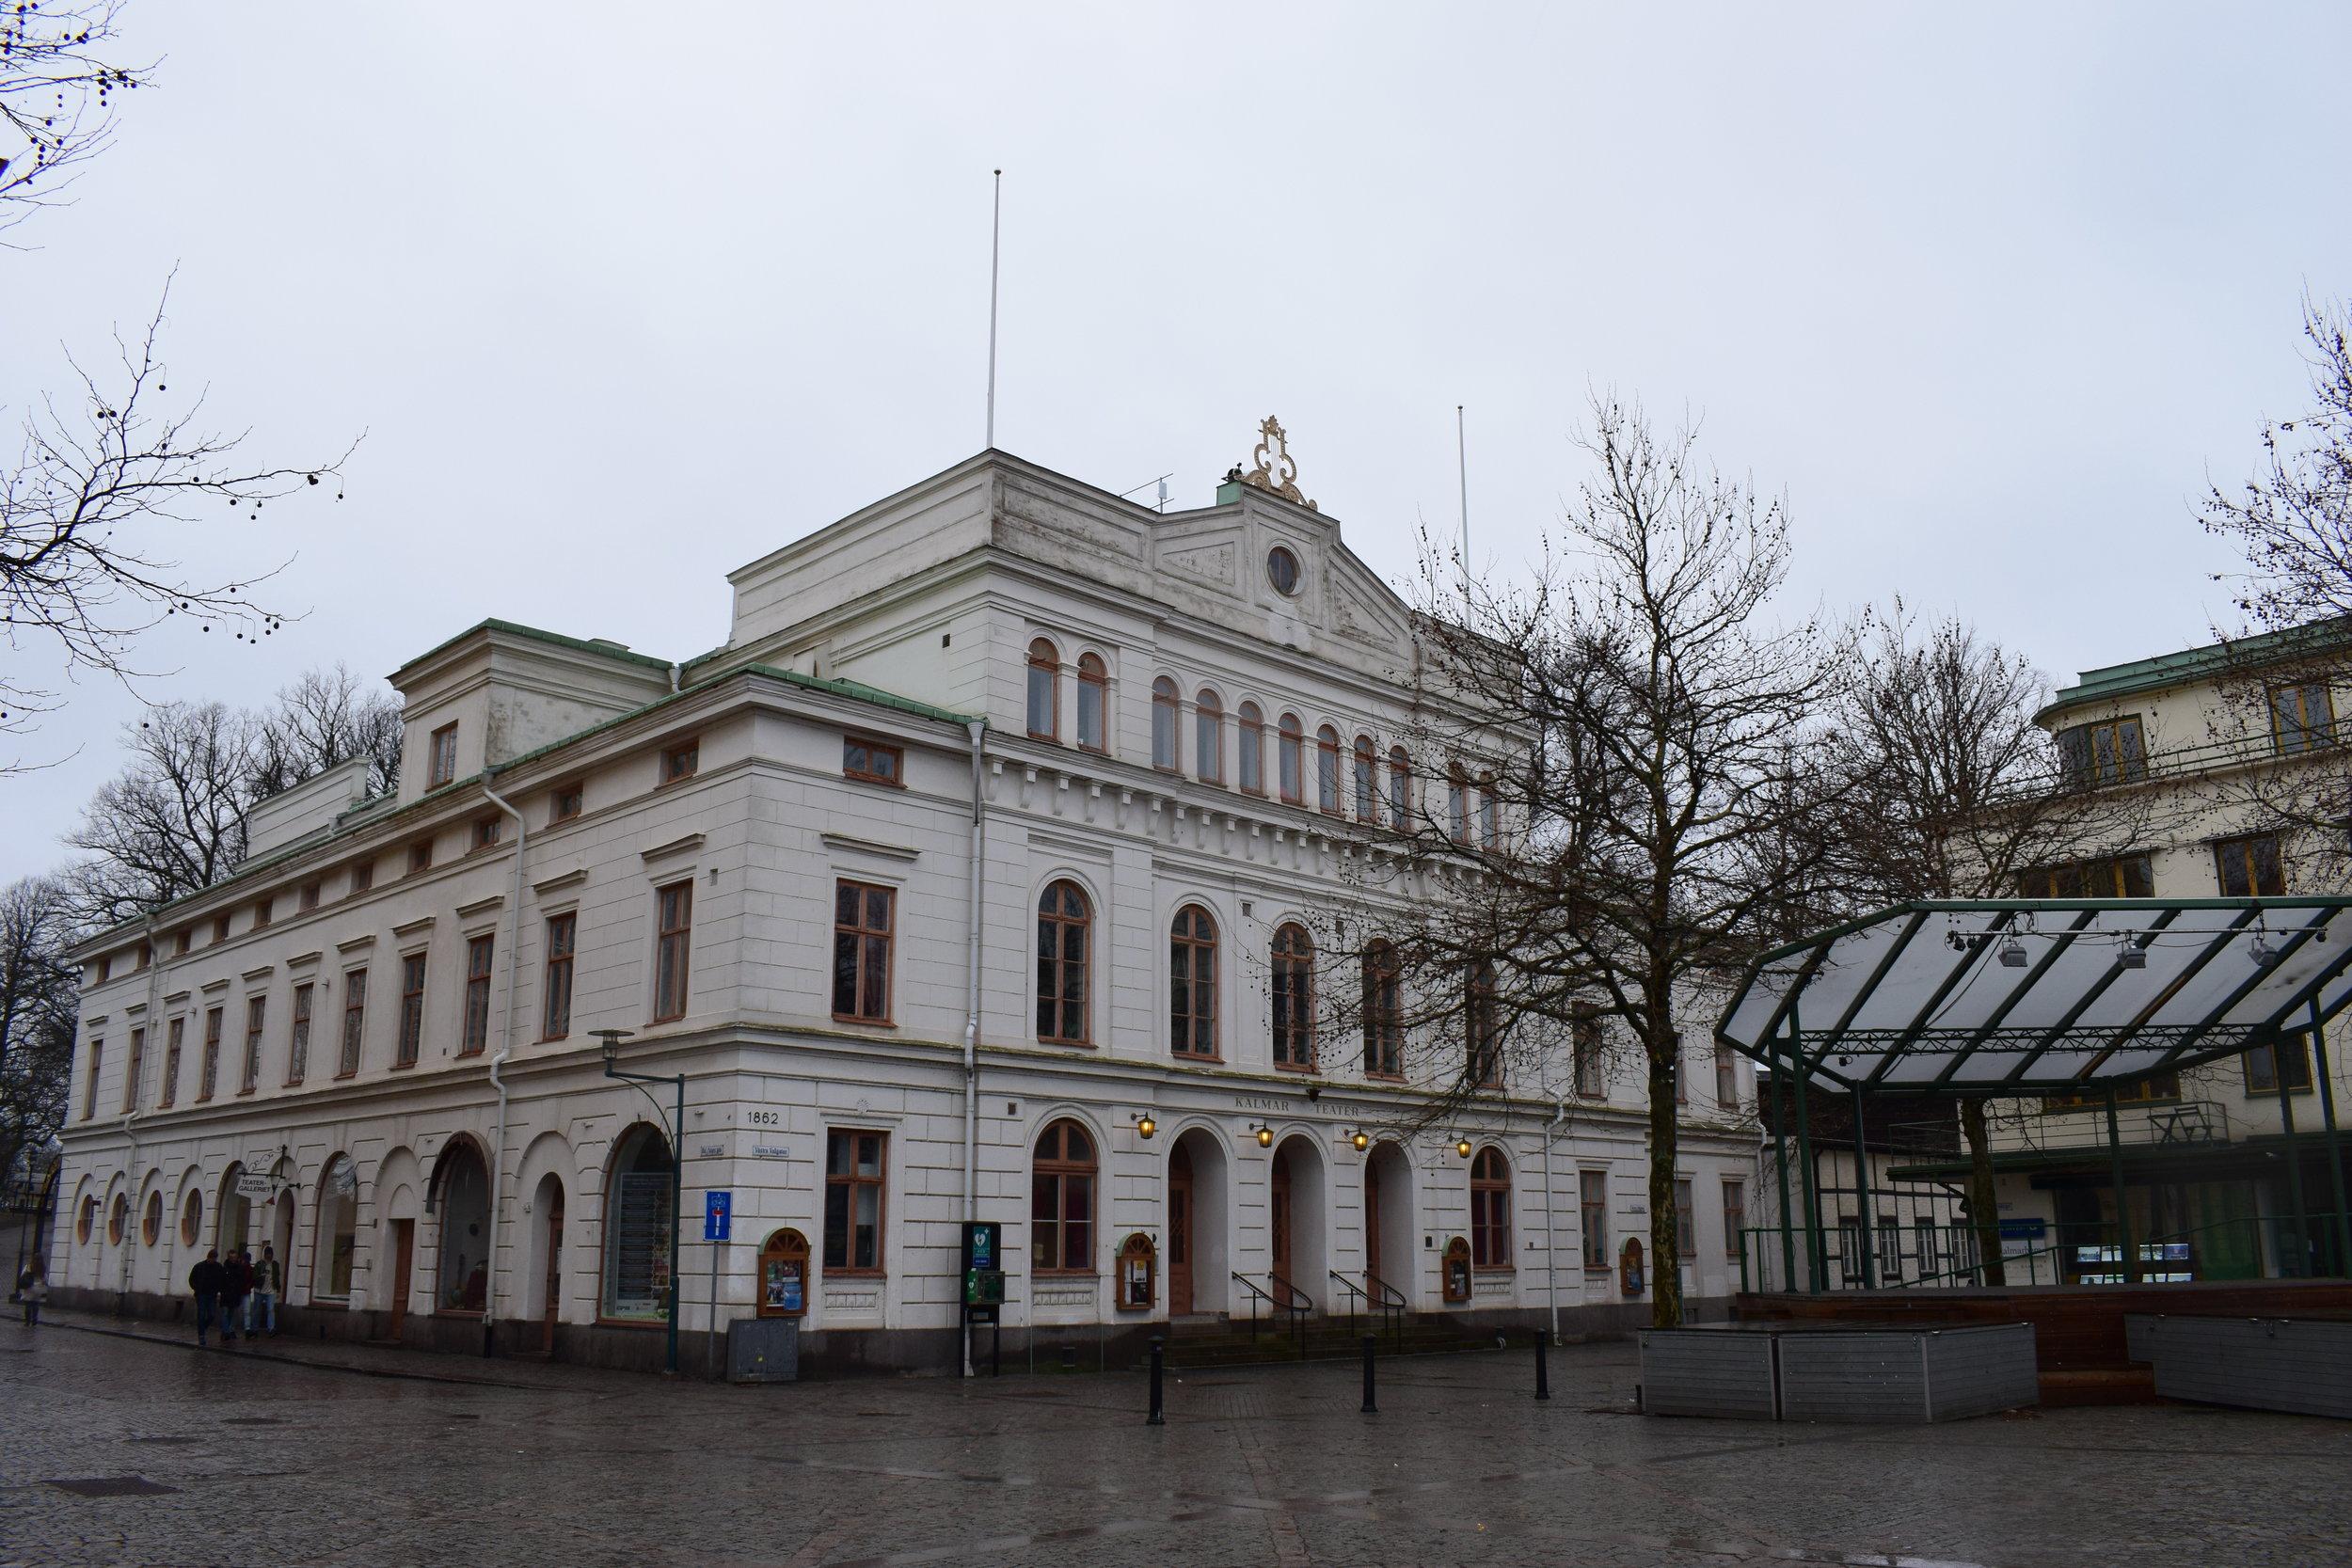 Kalmar Theatre